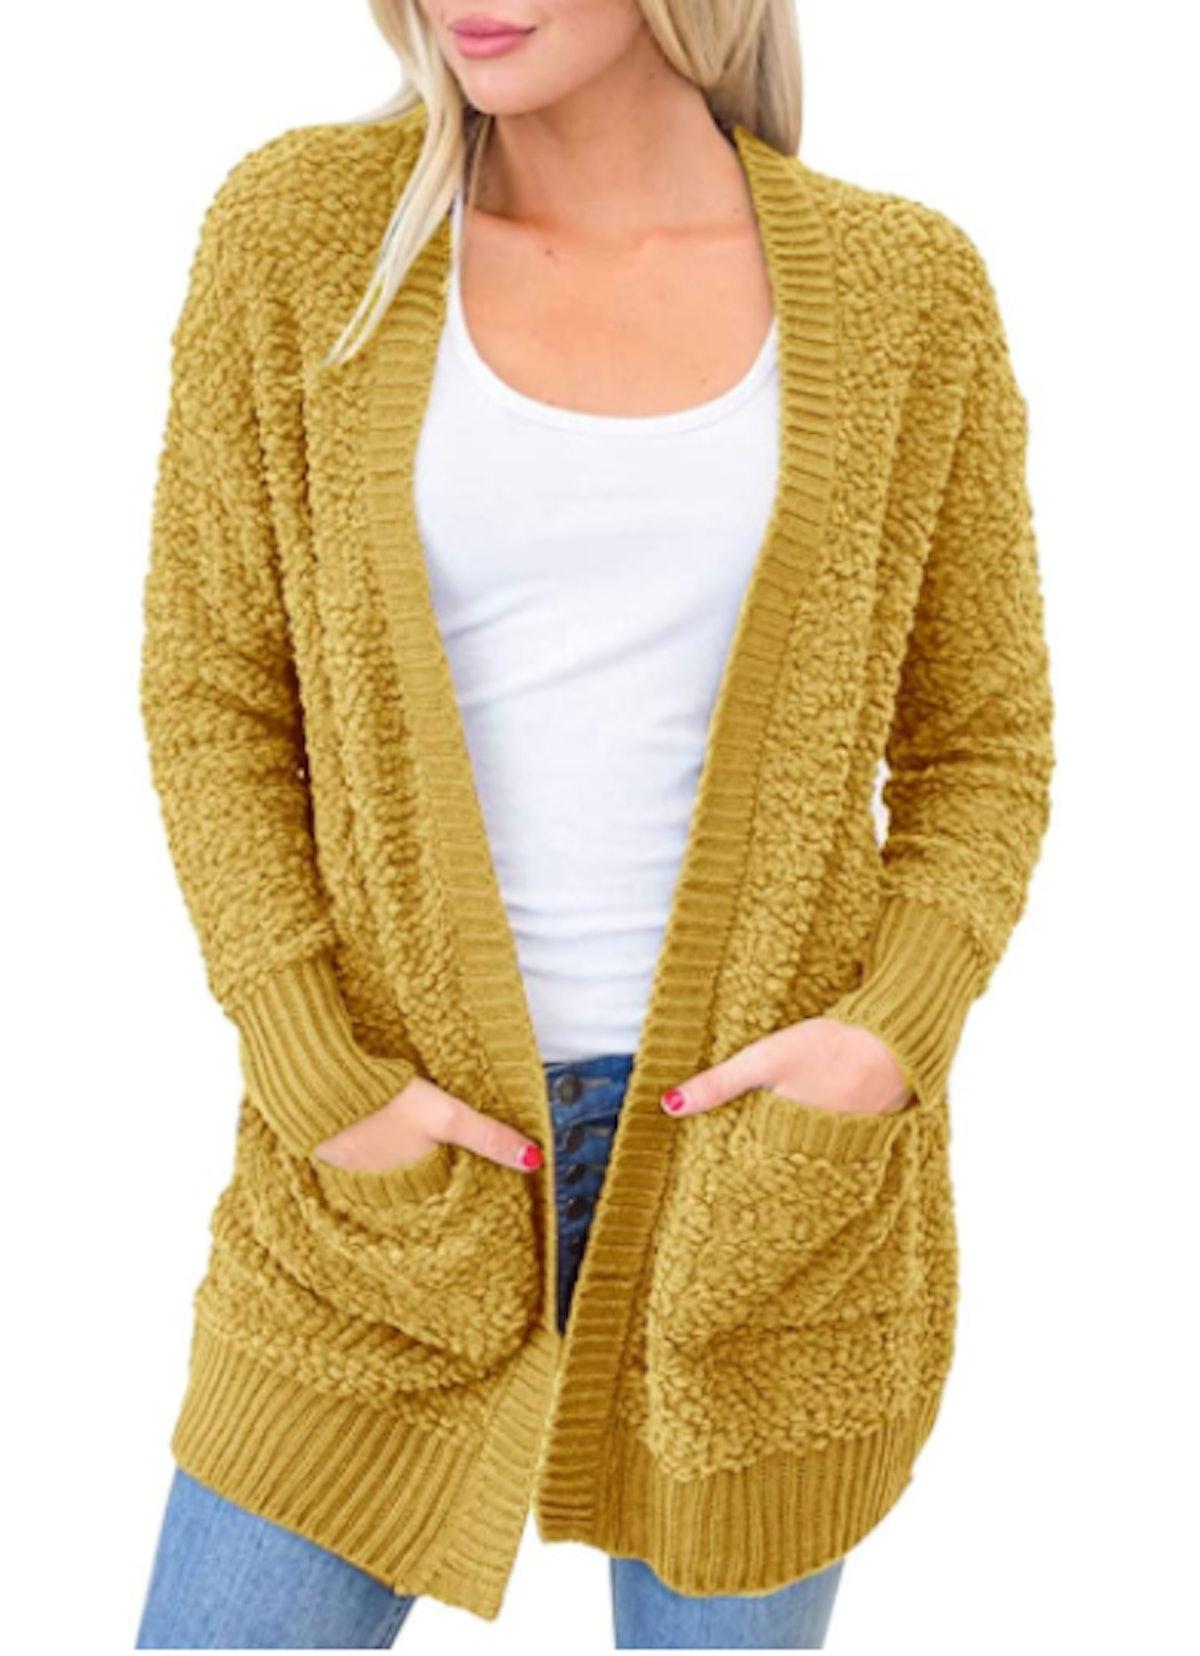 MEROKEETY Soft Chunky Cardigan with Pockets